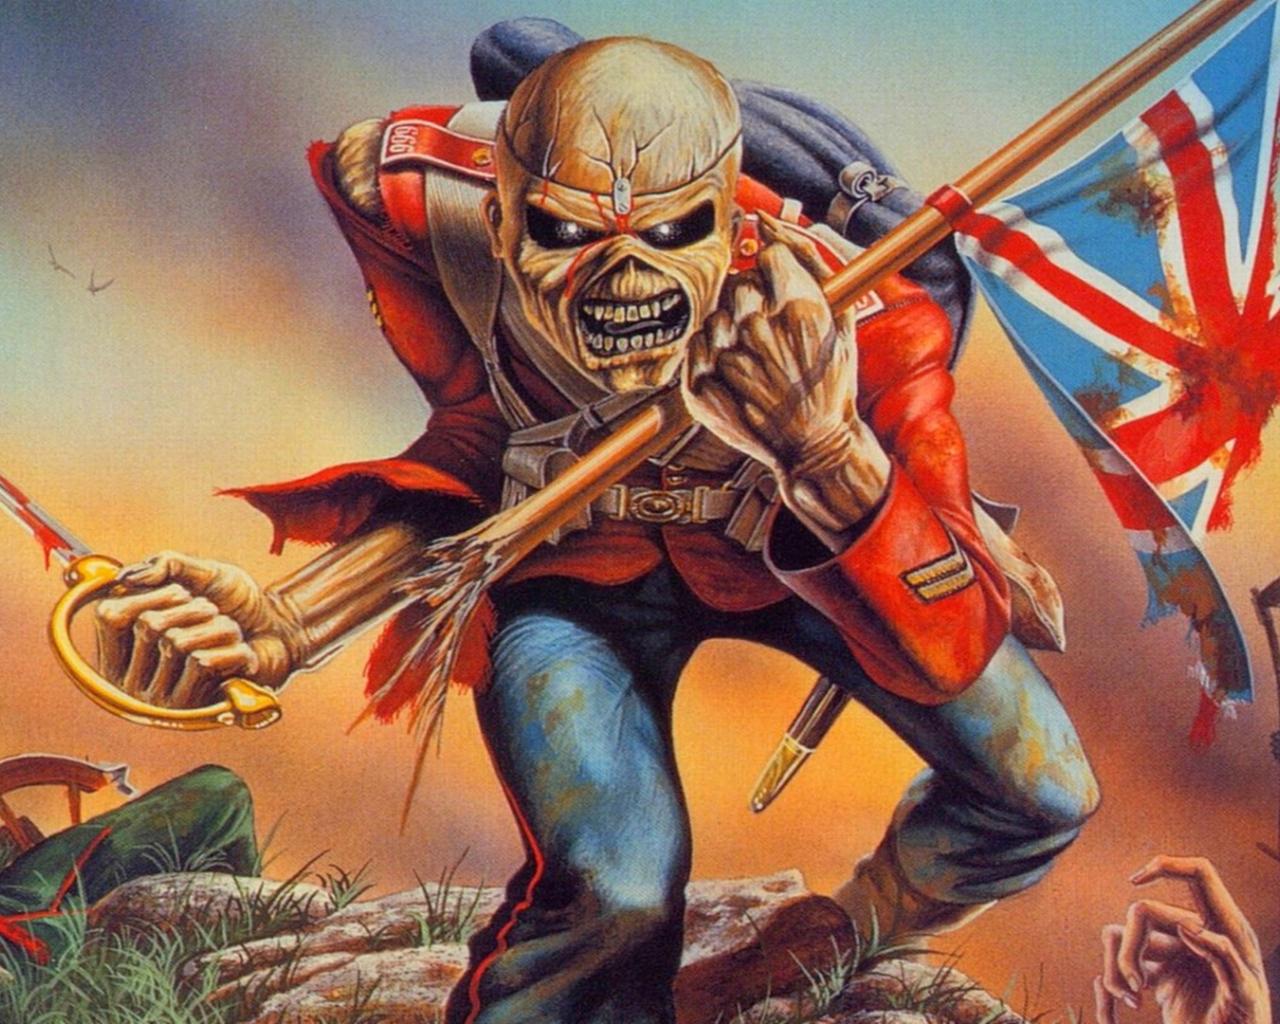 Free Download Iron Maiden Wallpaper Iron Maiden Hd Wallpaper